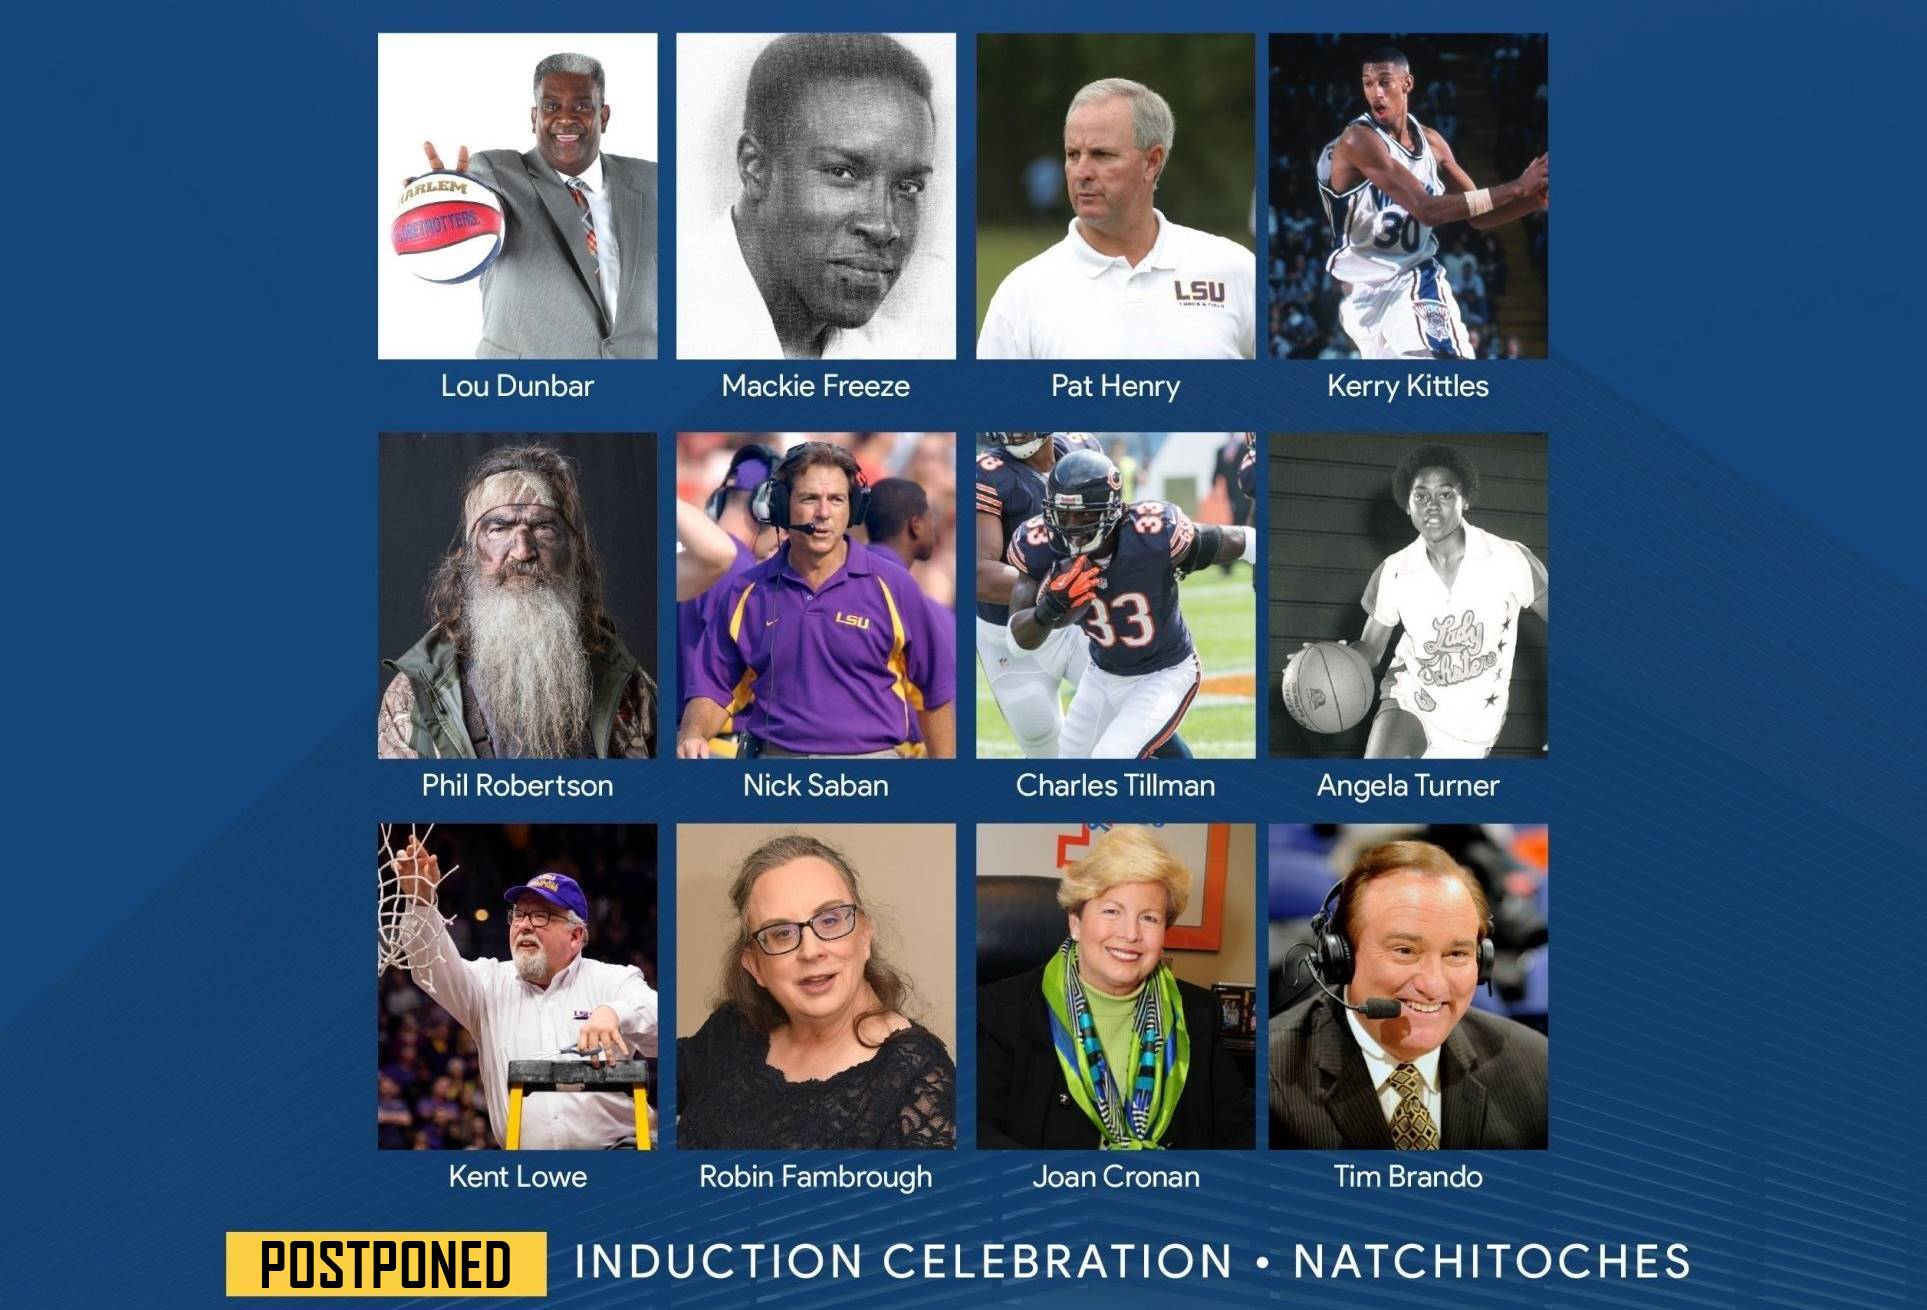 Louisiana Sports Hall of Fame 2020 Induction Celebration postponed